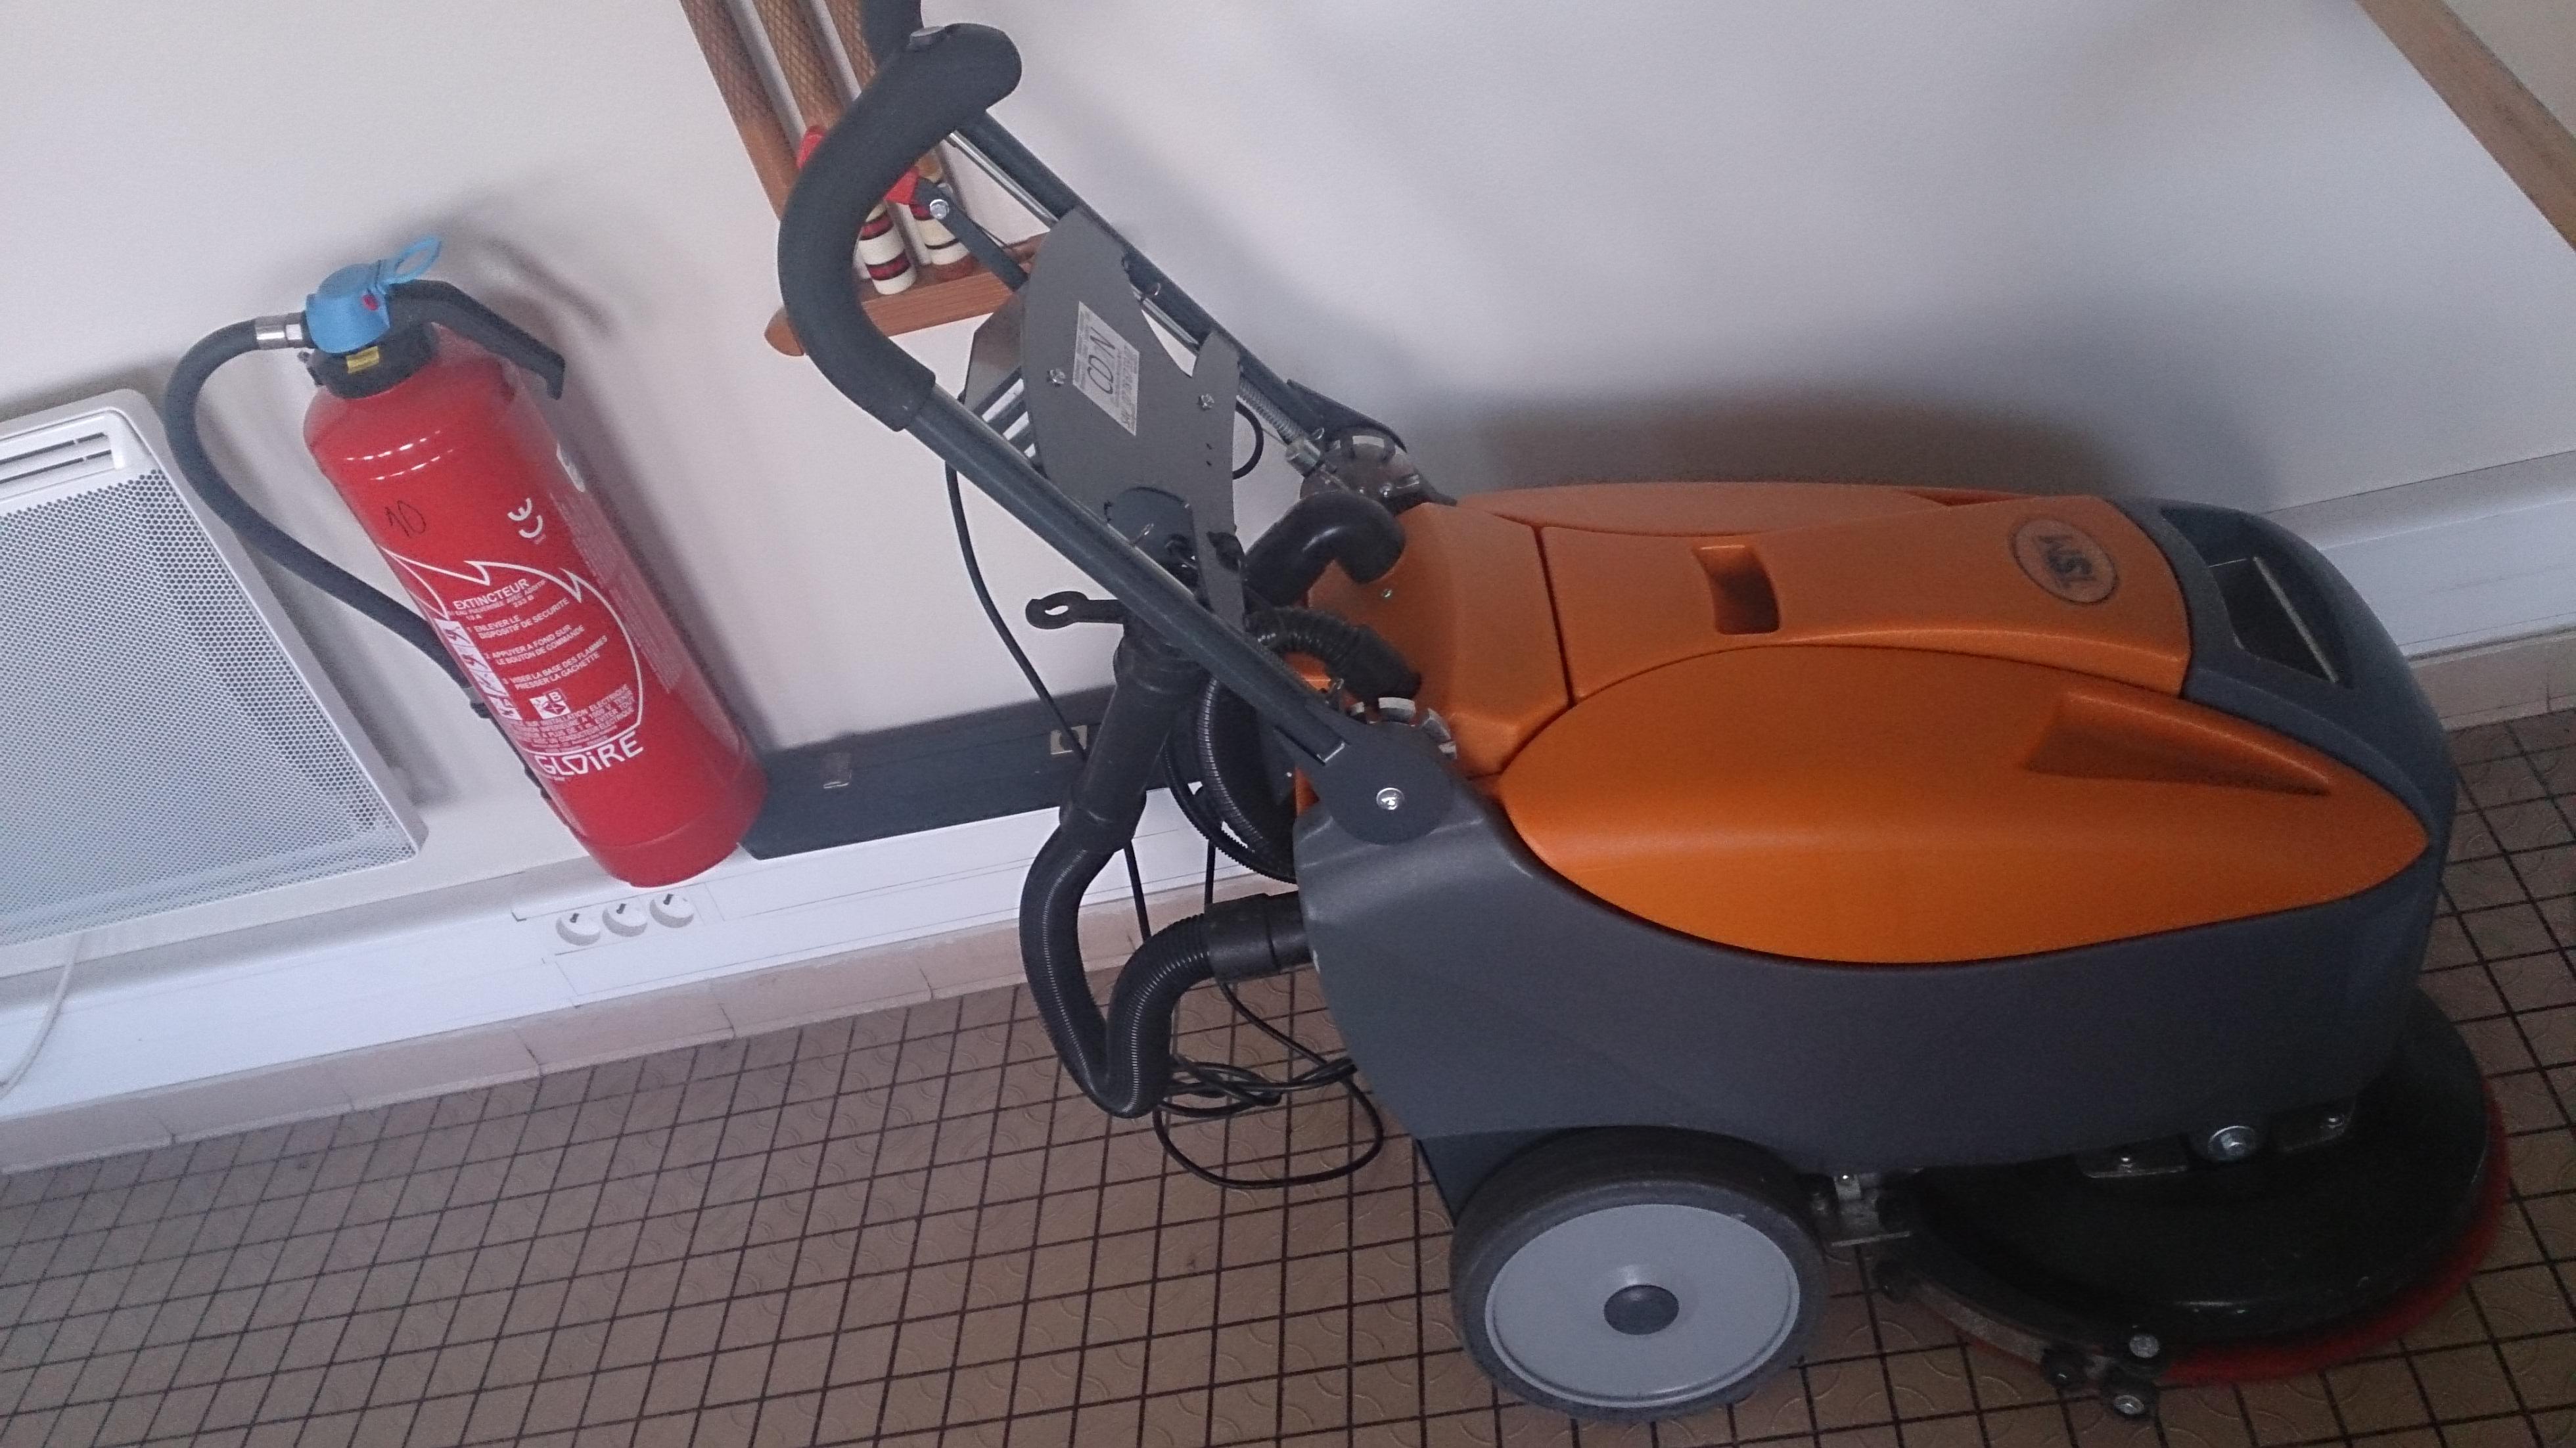 Auto-laveuse TSM GRANDE BRIO 35B location vente neuf ou occasion